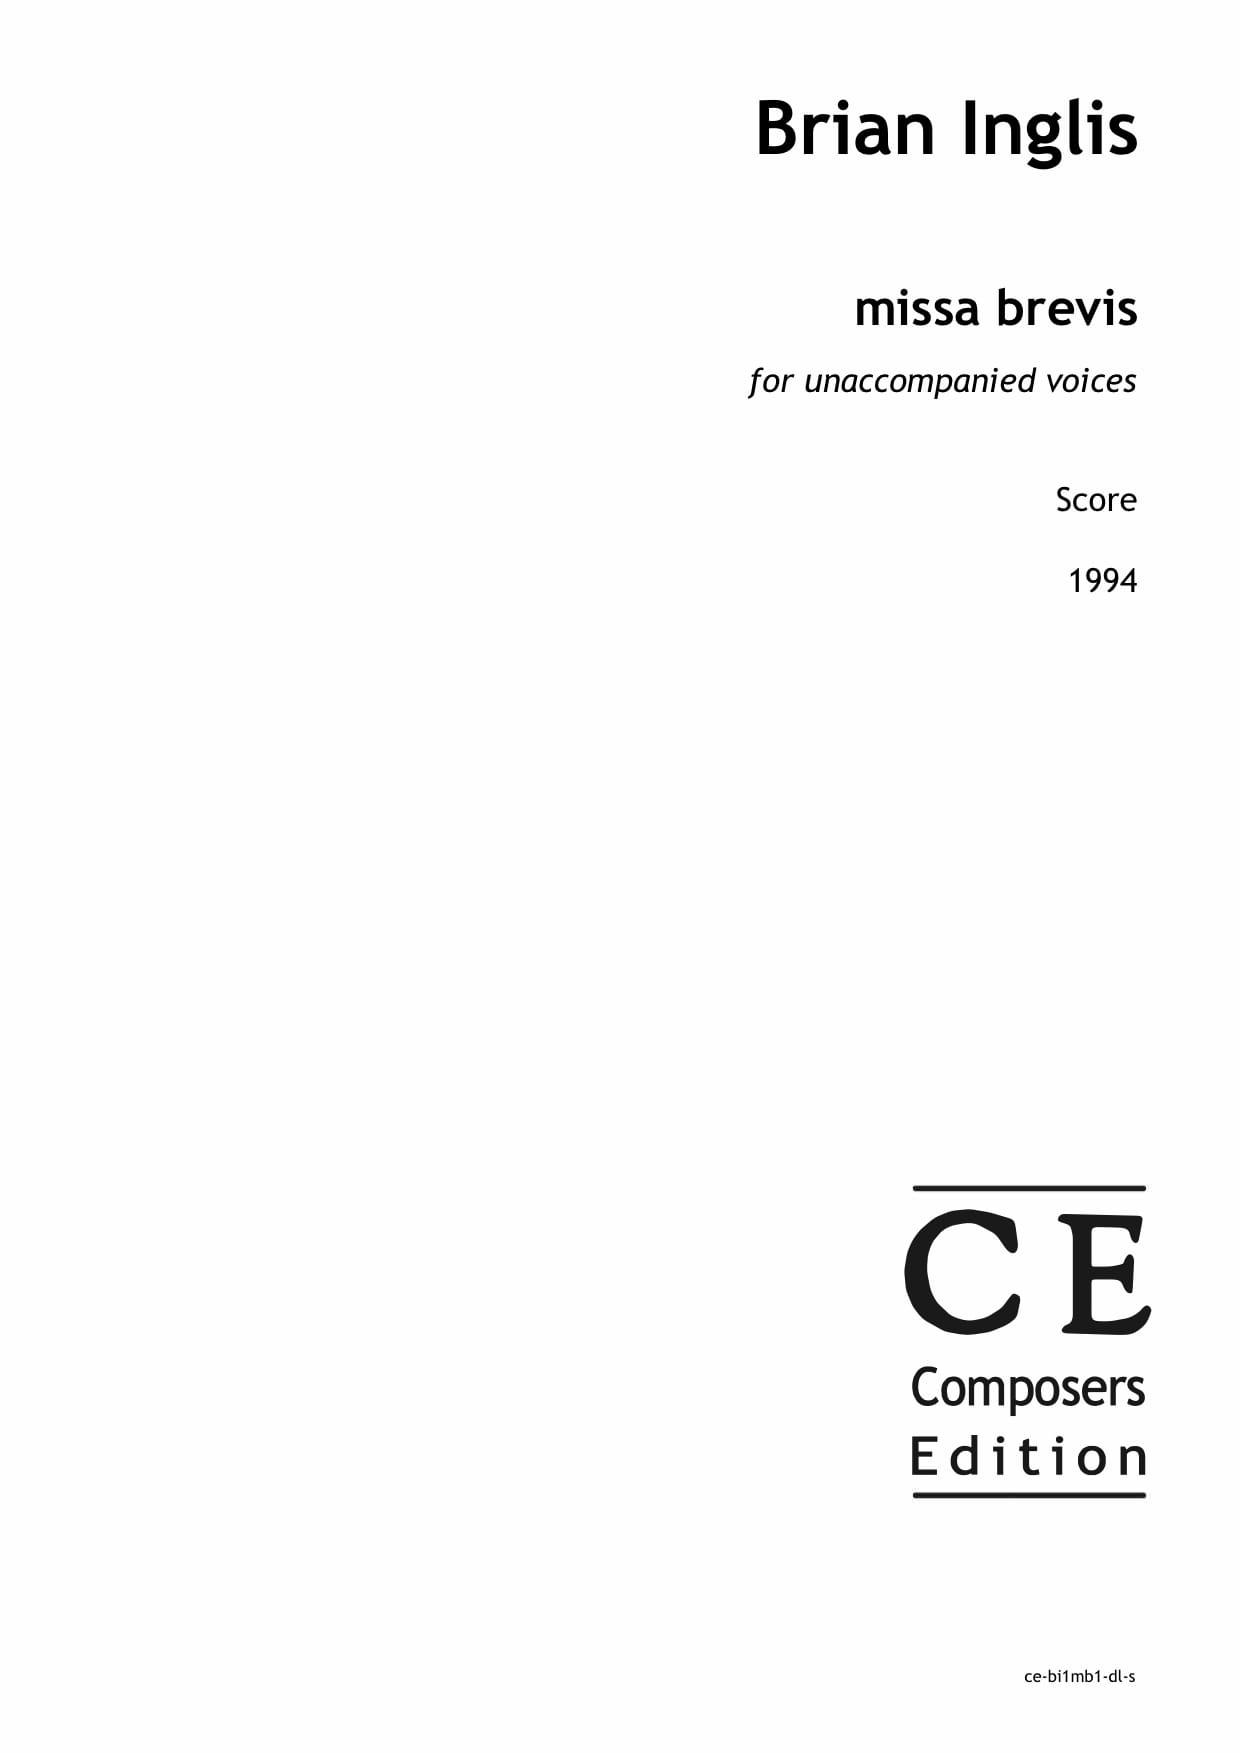 Brian Inglis: missa brevis for unaccompanied voices